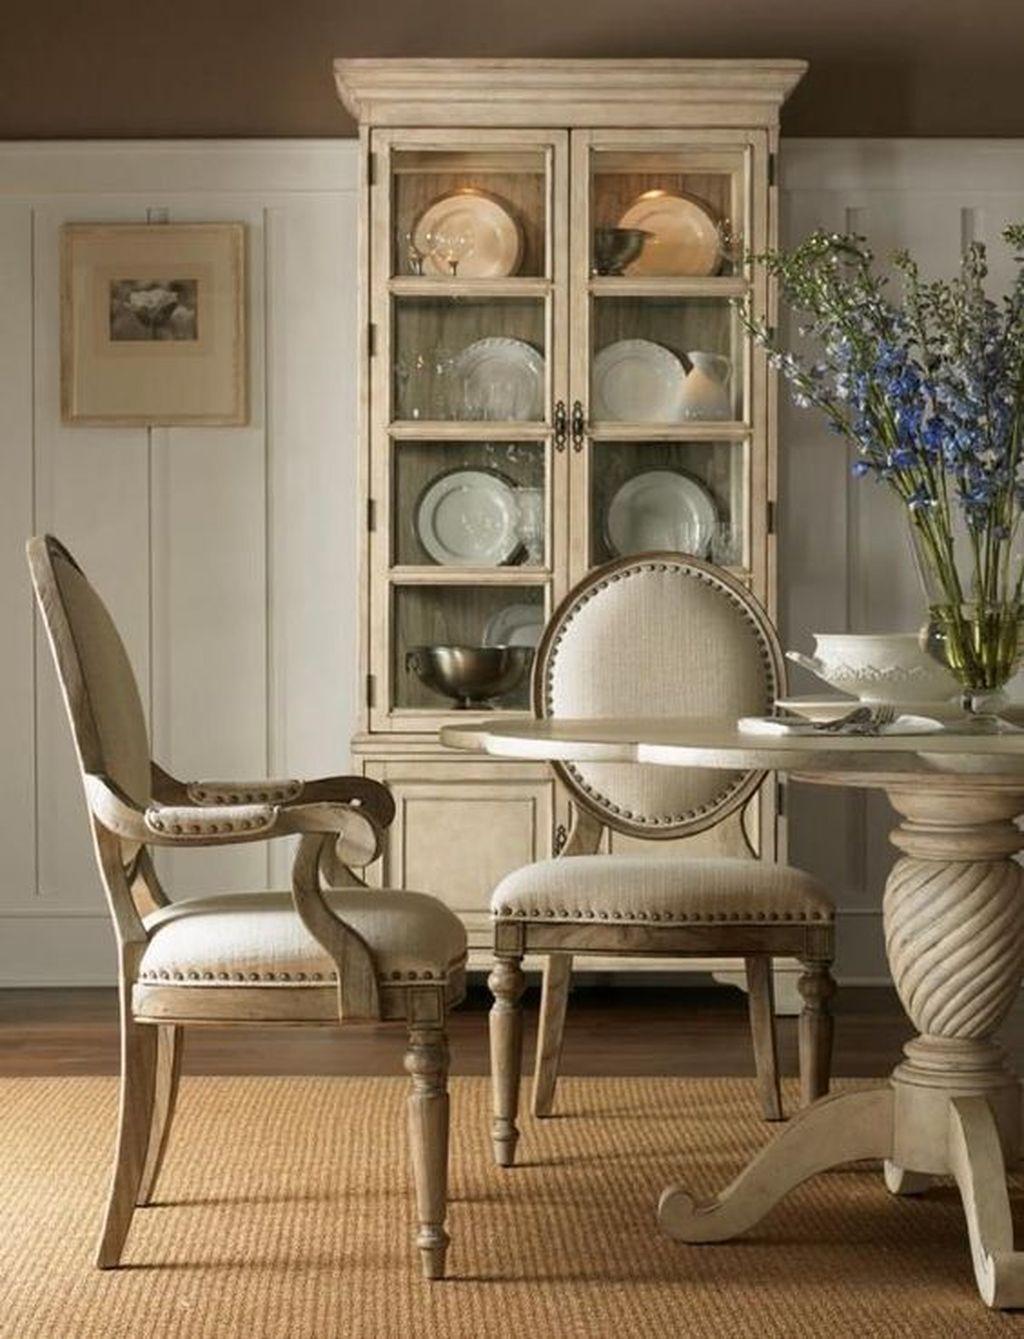 Amazing Farmhouse Dining Room Decor Ideas 29